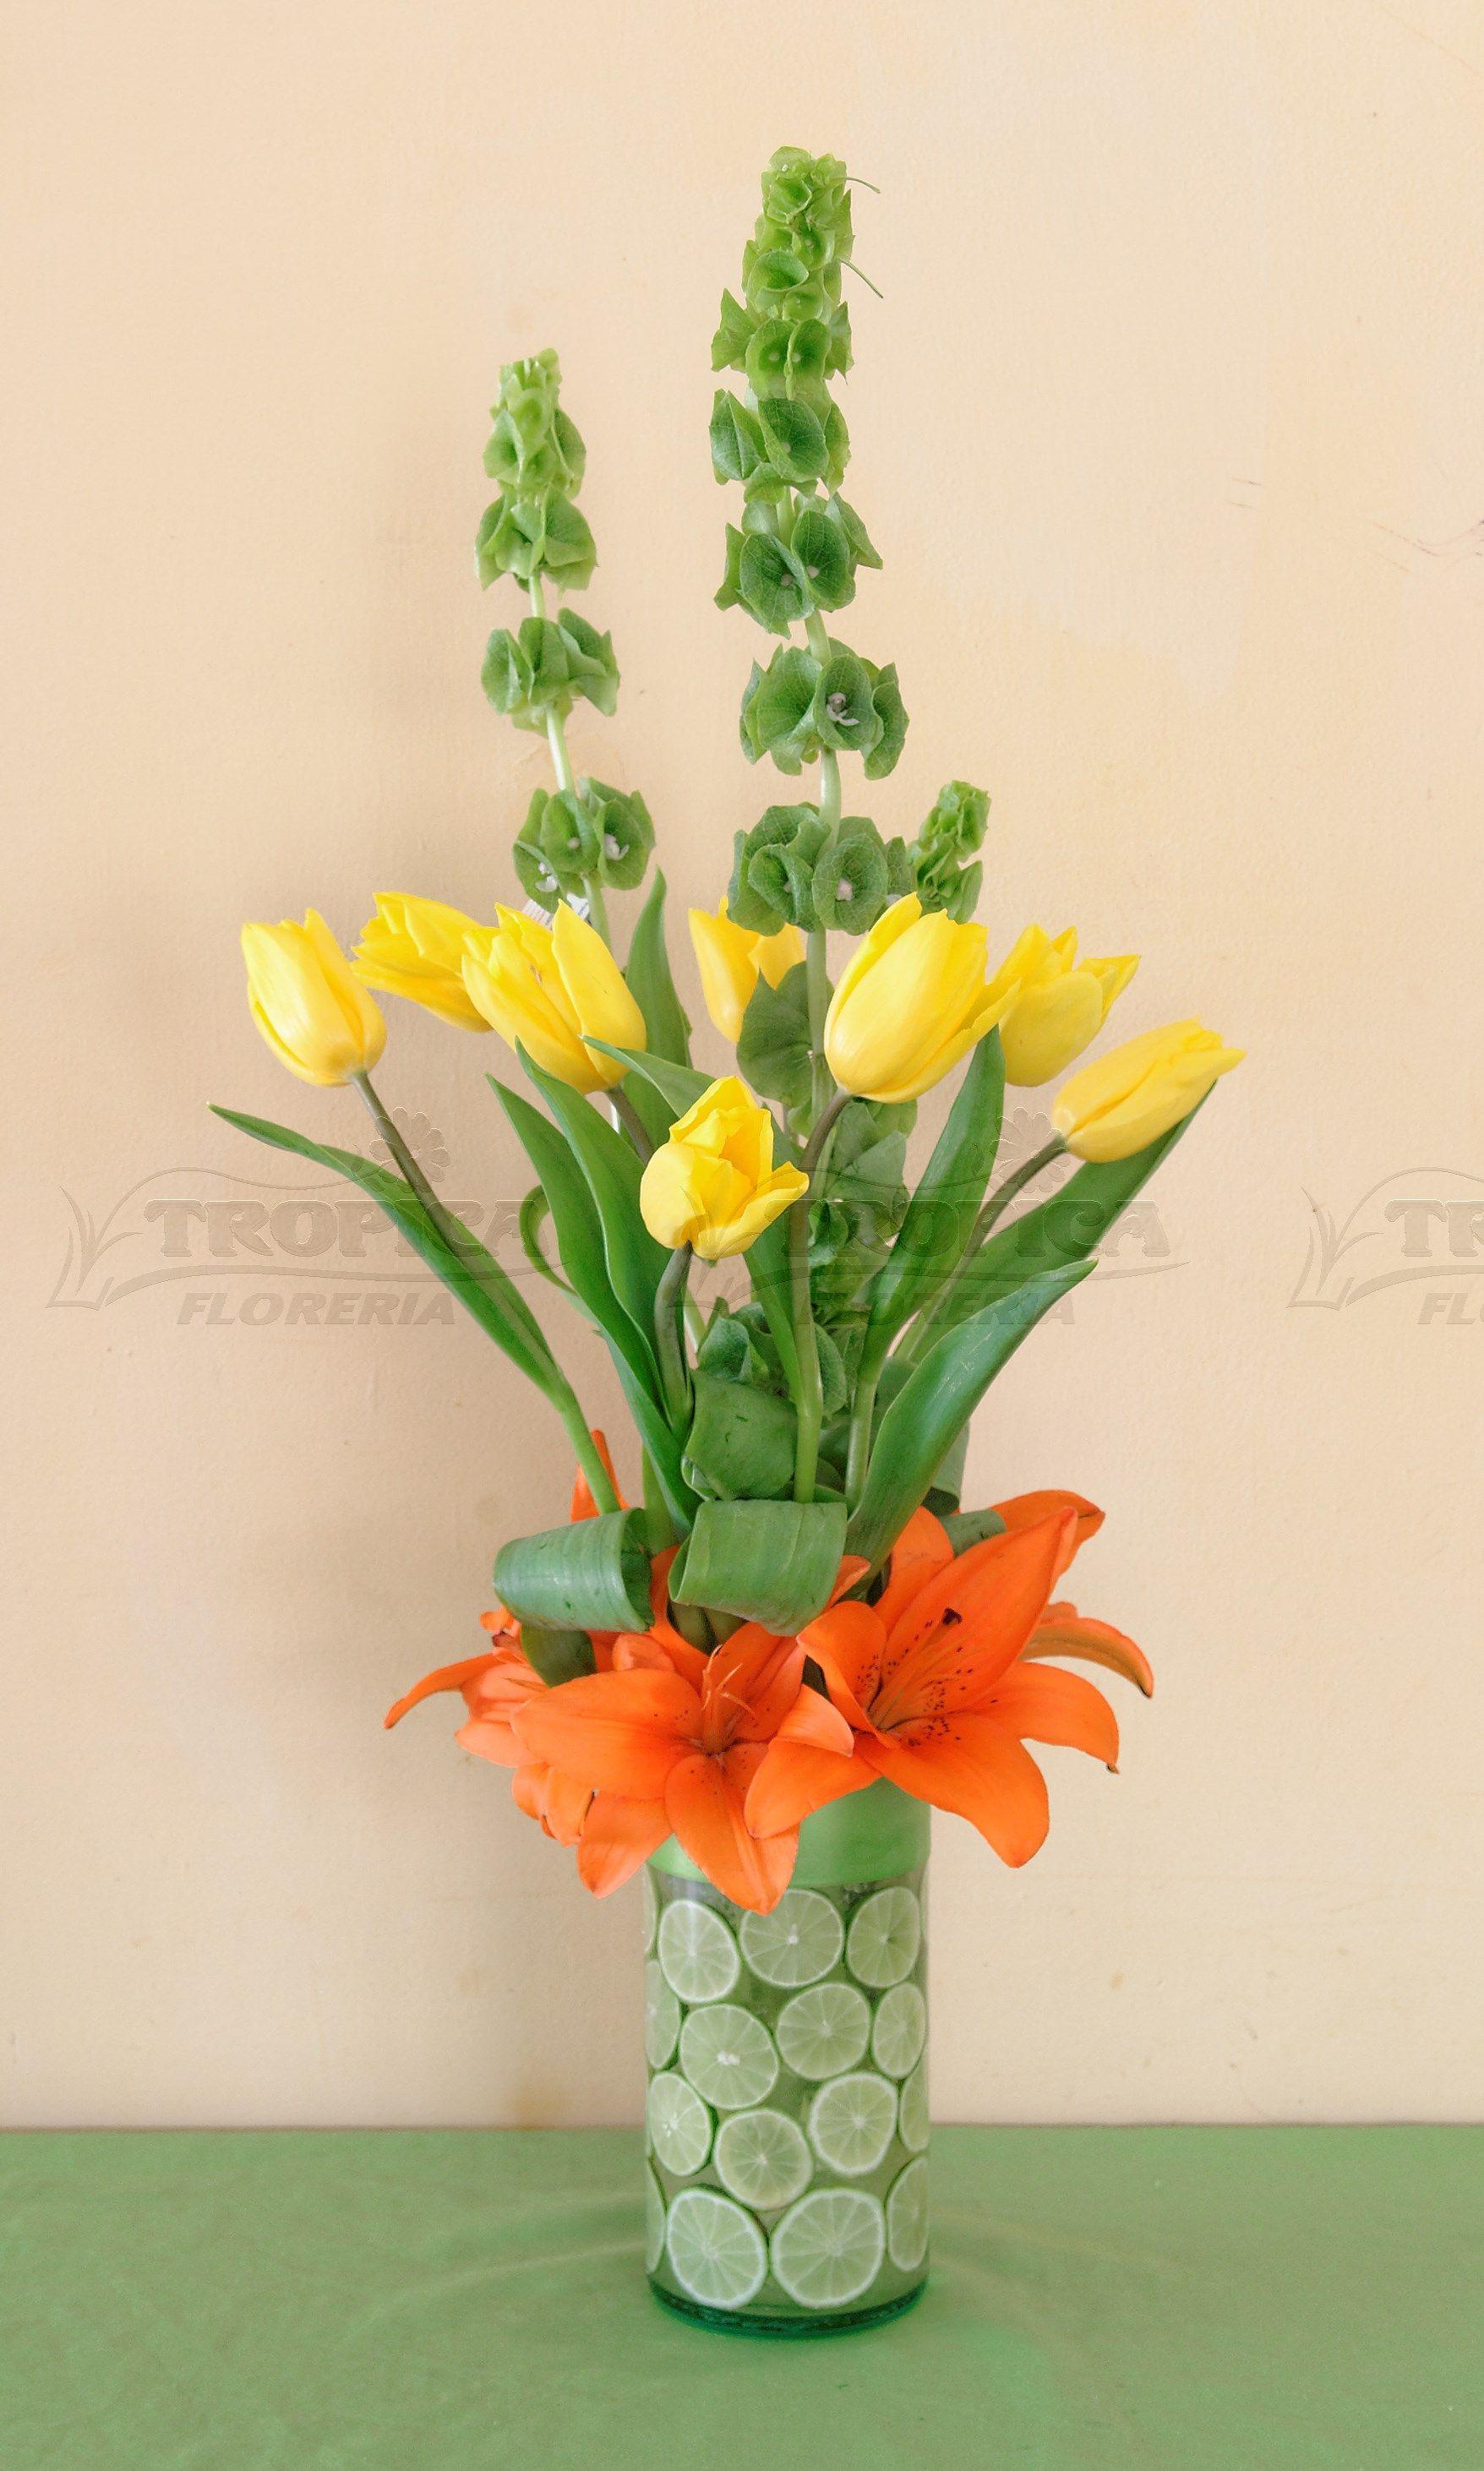 Vase Arrangements, Flower Arrangement, Flower Bouquets, Ikebana, Floral Design, Hello